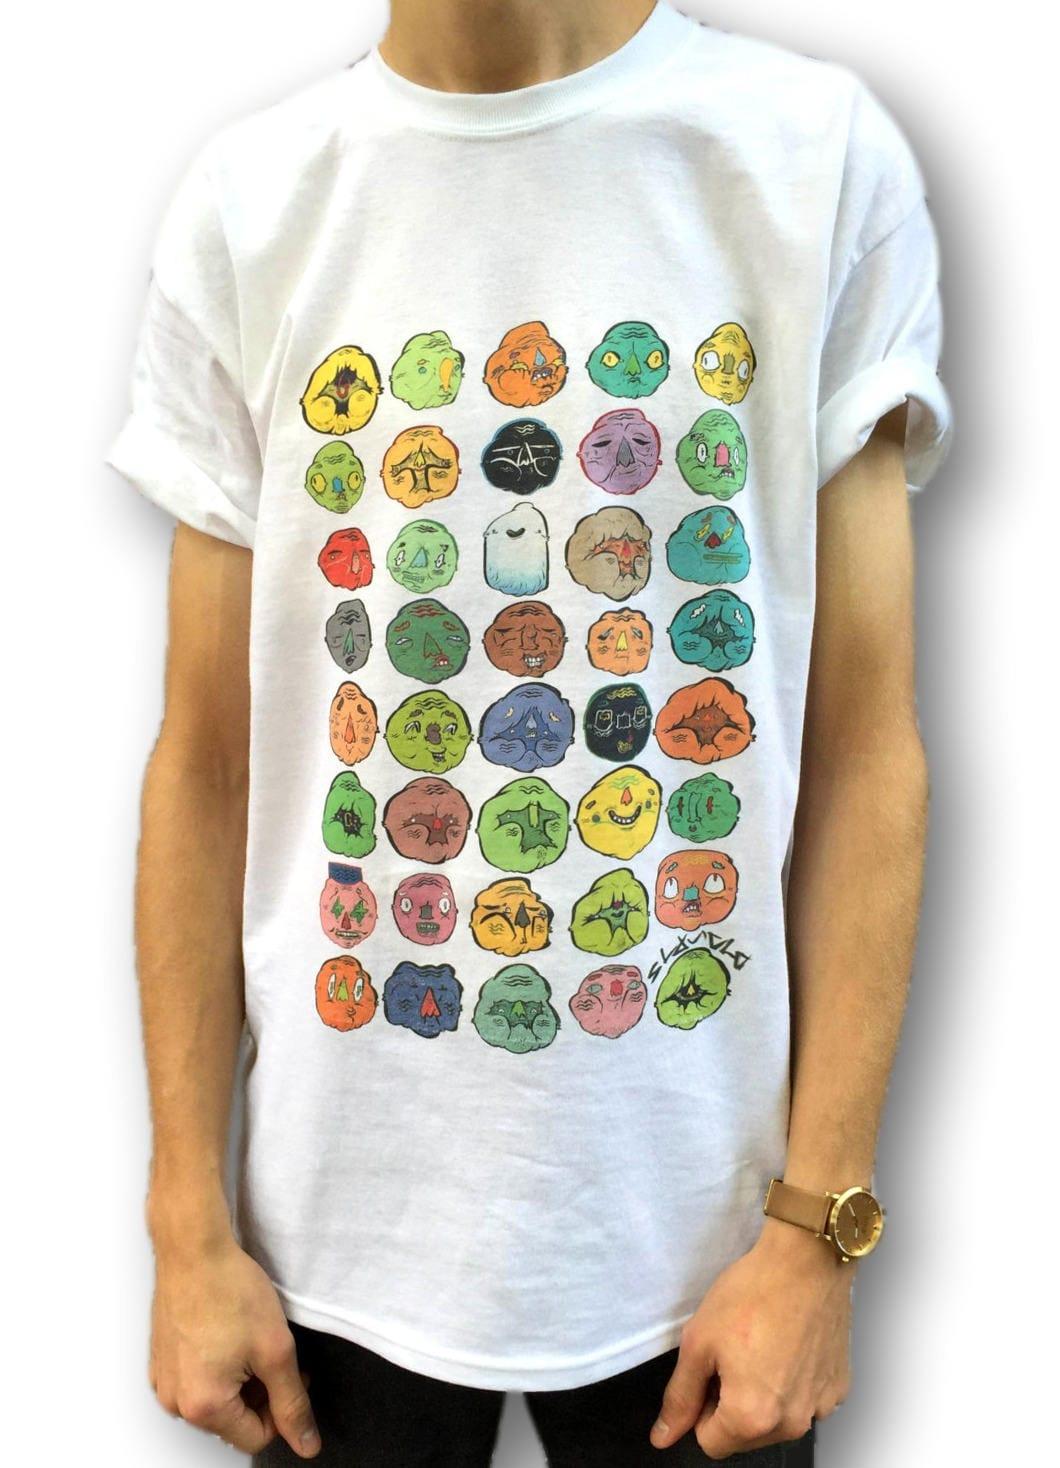 Indie T Shirt, 90s Grunge T Shirt, Graphic Tee, Men's Cartoon T-Shirt, Men's Alternative Clothing, Women's Indie Top, Men's Baggy Tee, Shirt